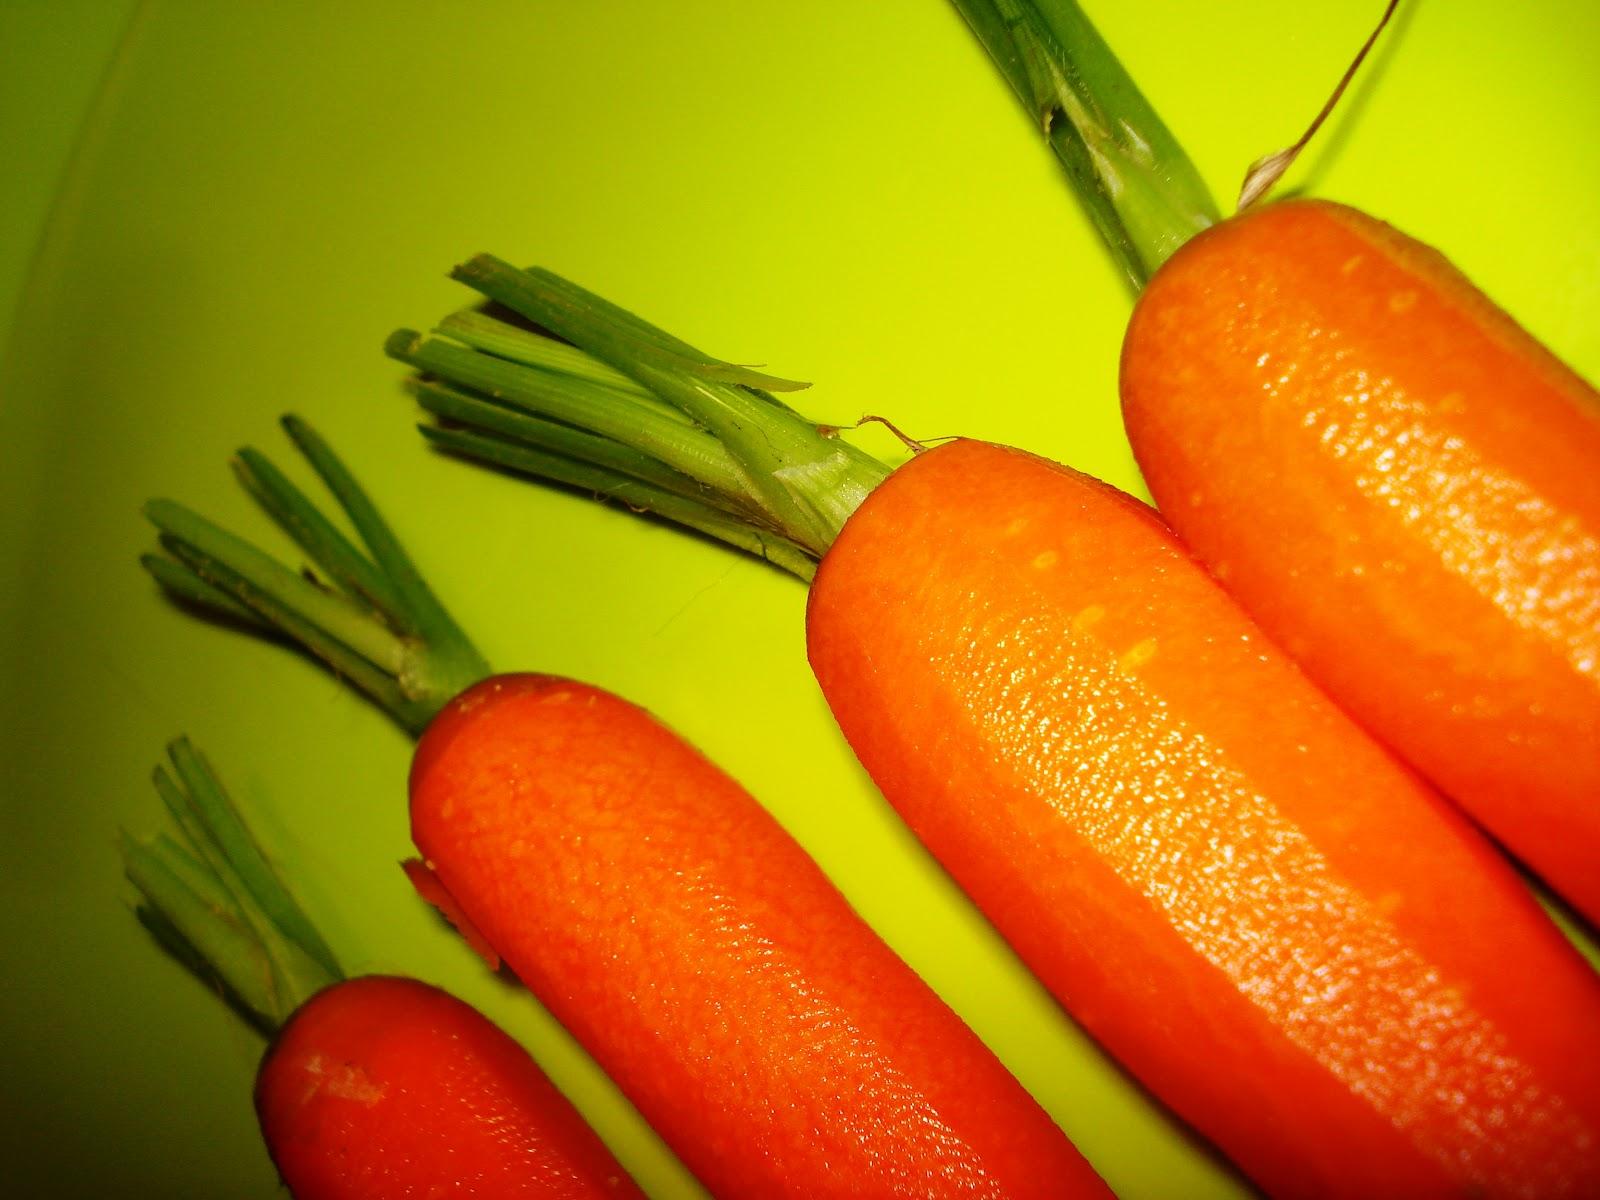 salade de carottes et choux romanesco ou brocolis. Black Bedroom Furniture Sets. Home Design Ideas